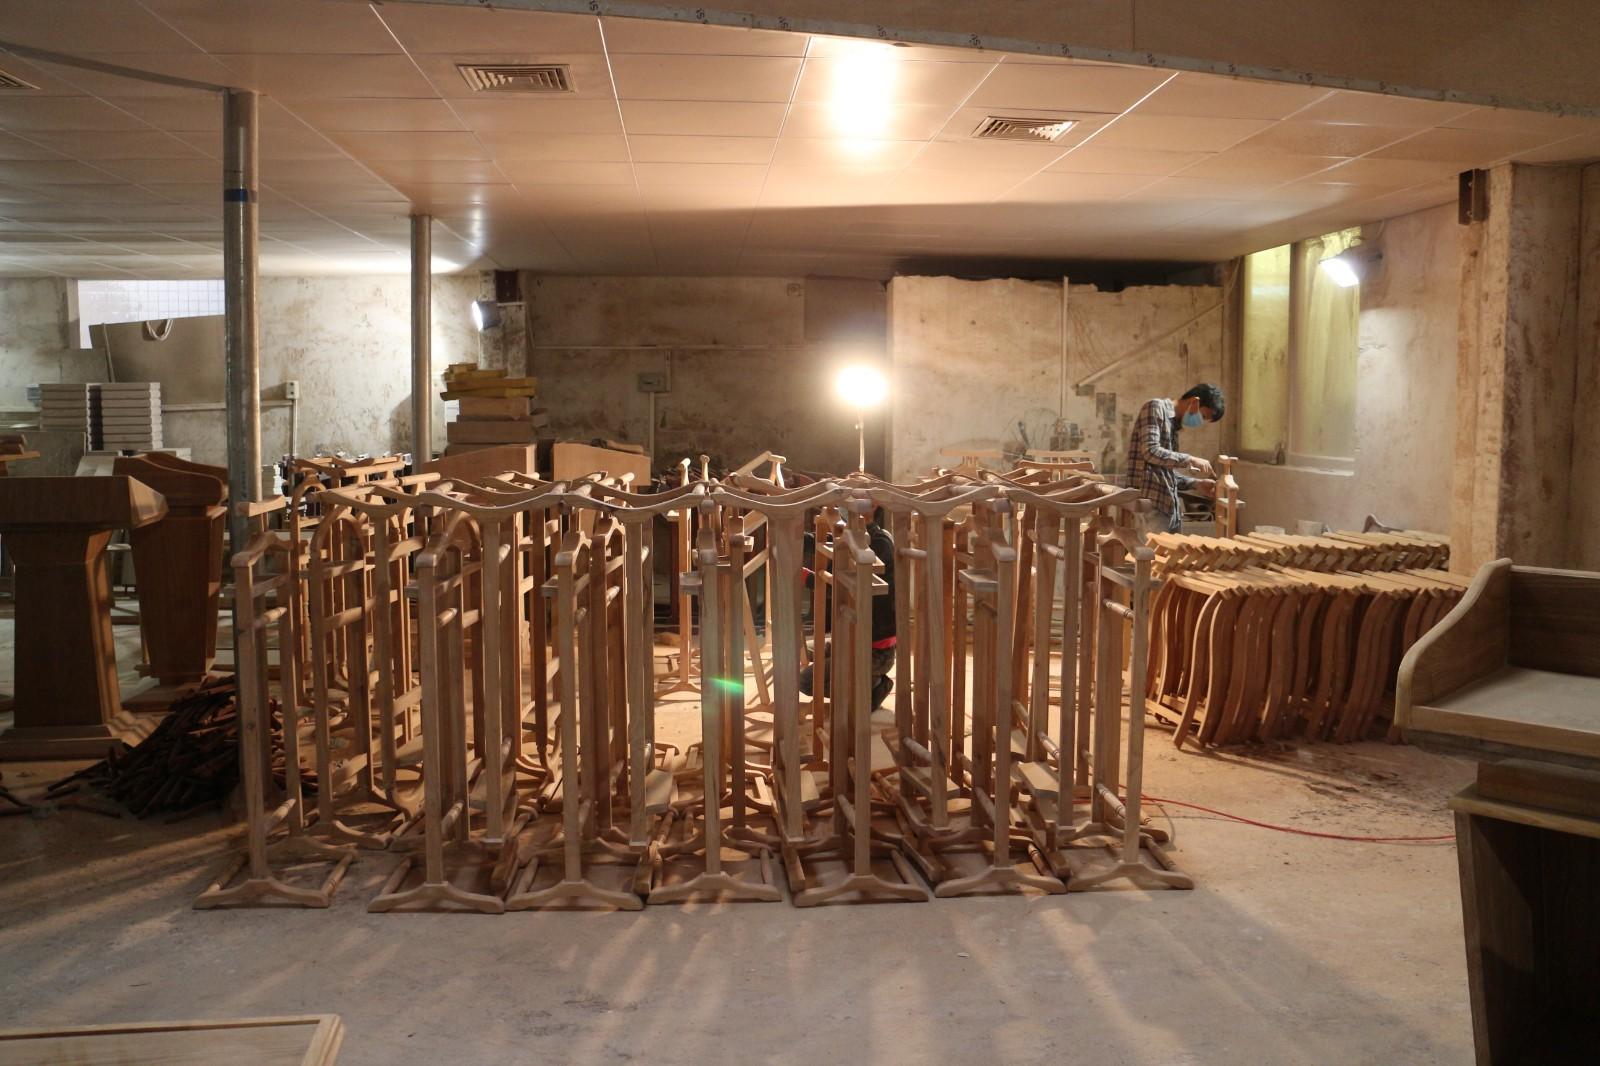 Fenghe-Newspaper Rack Factory, Newspaper Display Stands | Fenghe-3